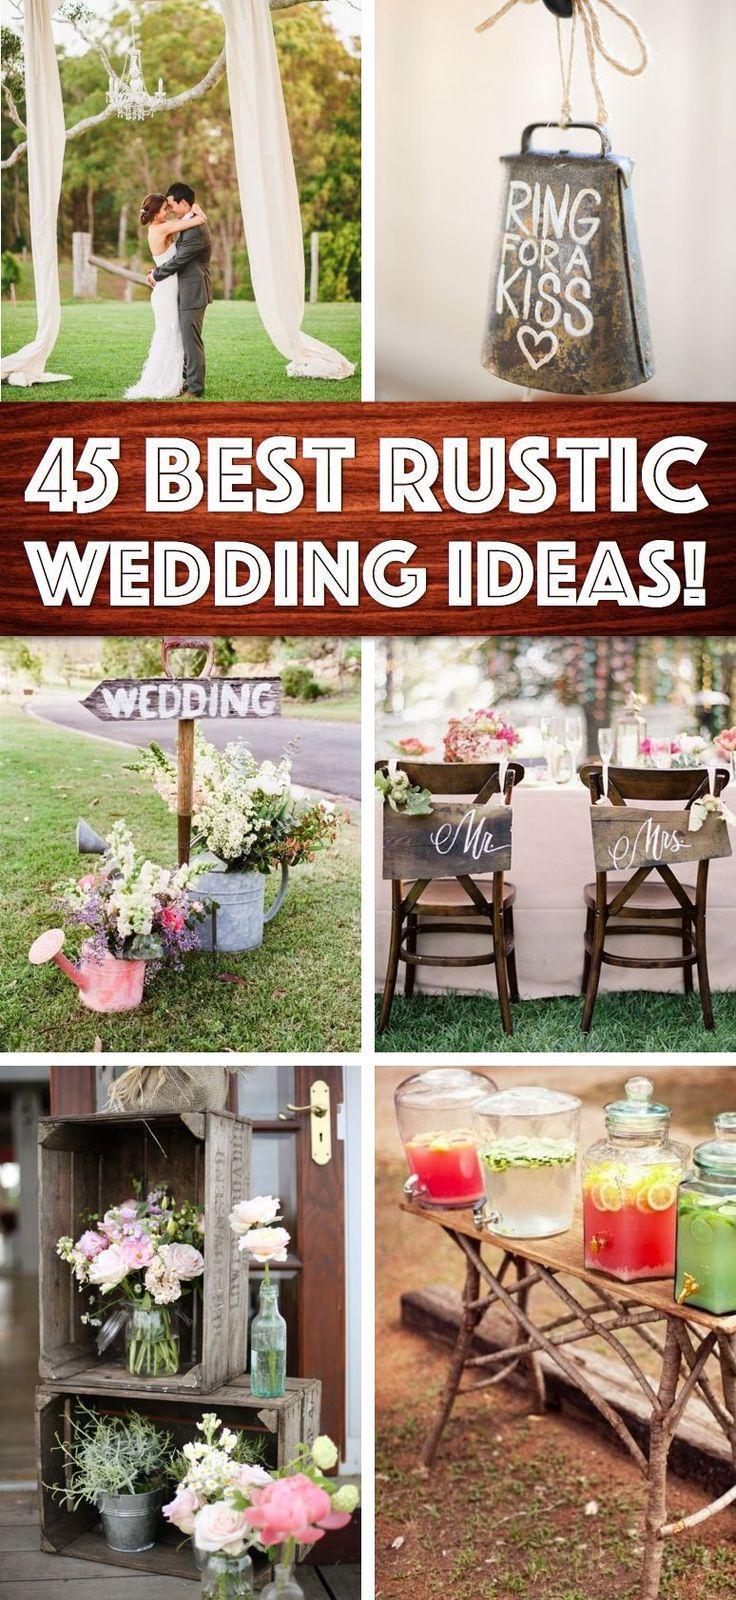 25 Best Rustic Chic Weddings Ideas On Pinterest